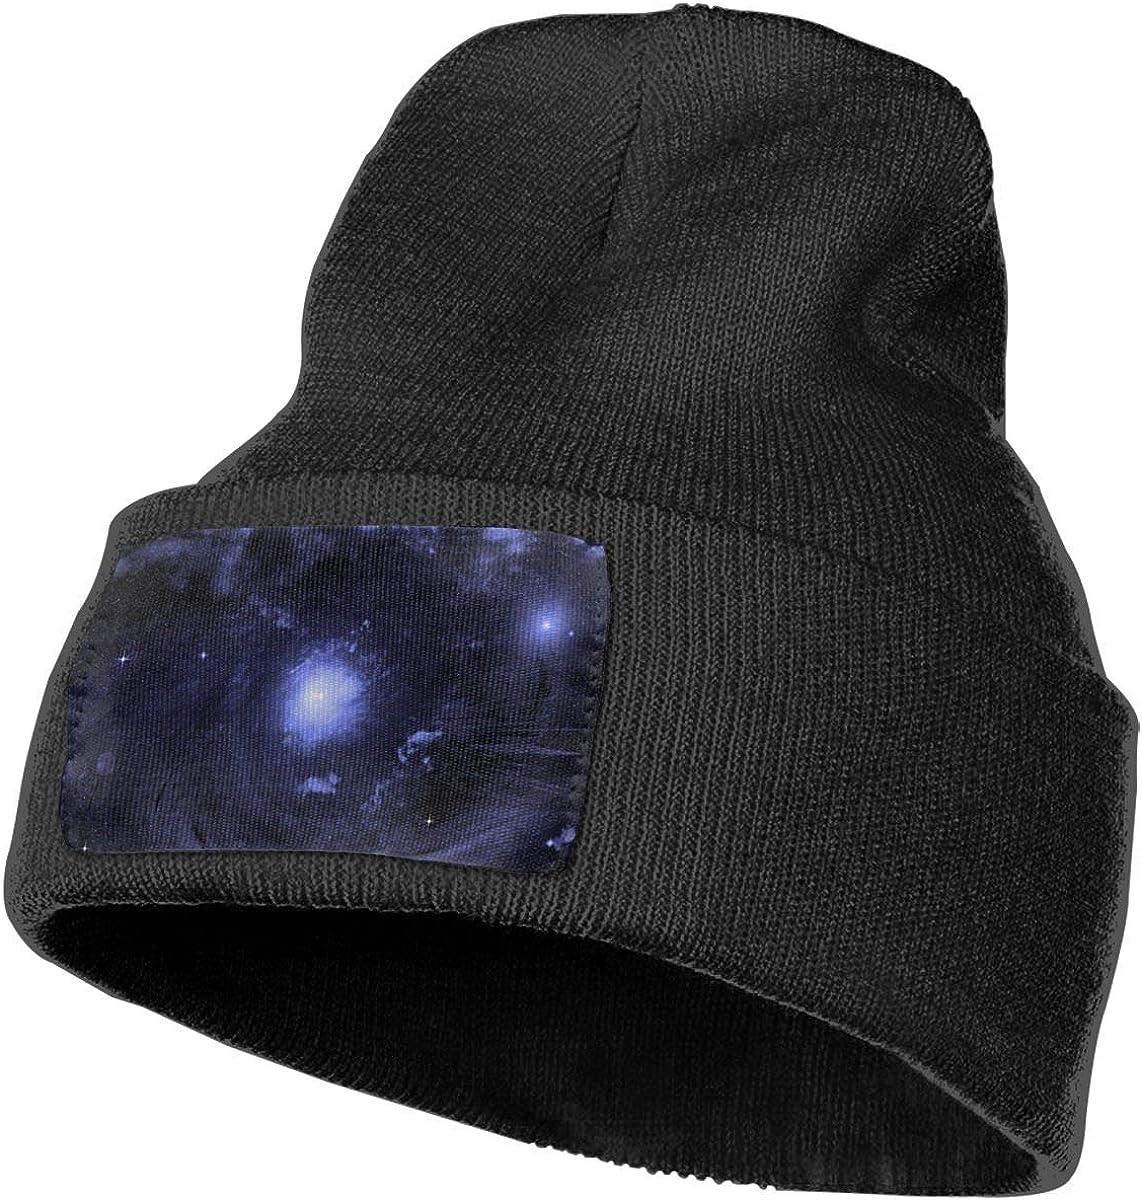 100/% Acrylic Acid Mas Beanie Hat Ruin Dark Purple Aurora Fashion Knitting Hat for Men Women